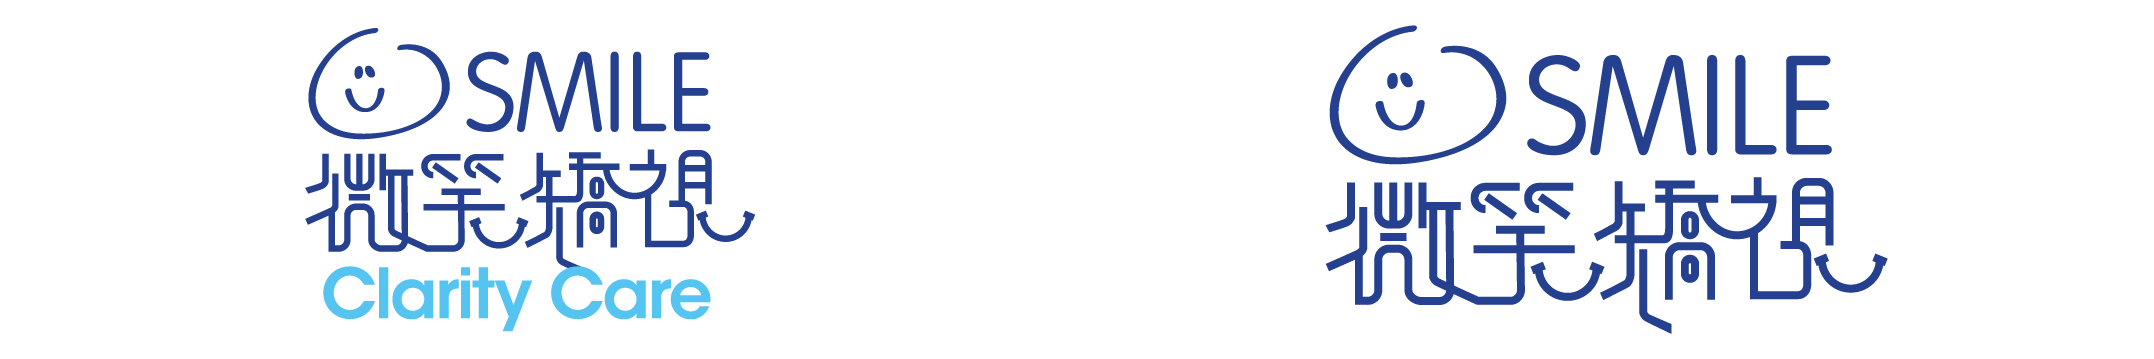 smile & smile clarity care logo